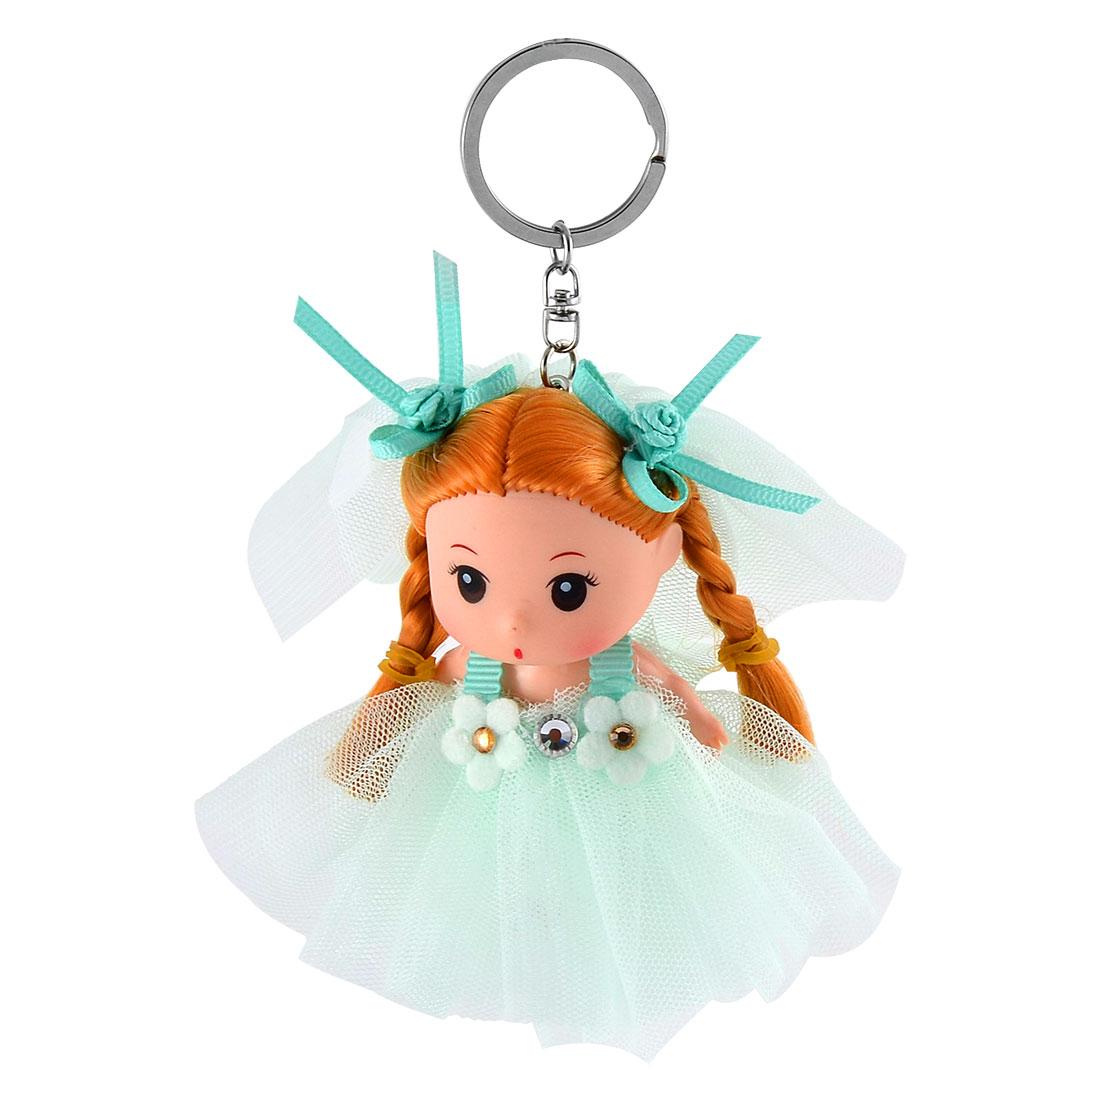 Women Trunk Wedding Dress Girl Pendant Design Hang Doll Keychain Key Ring Green